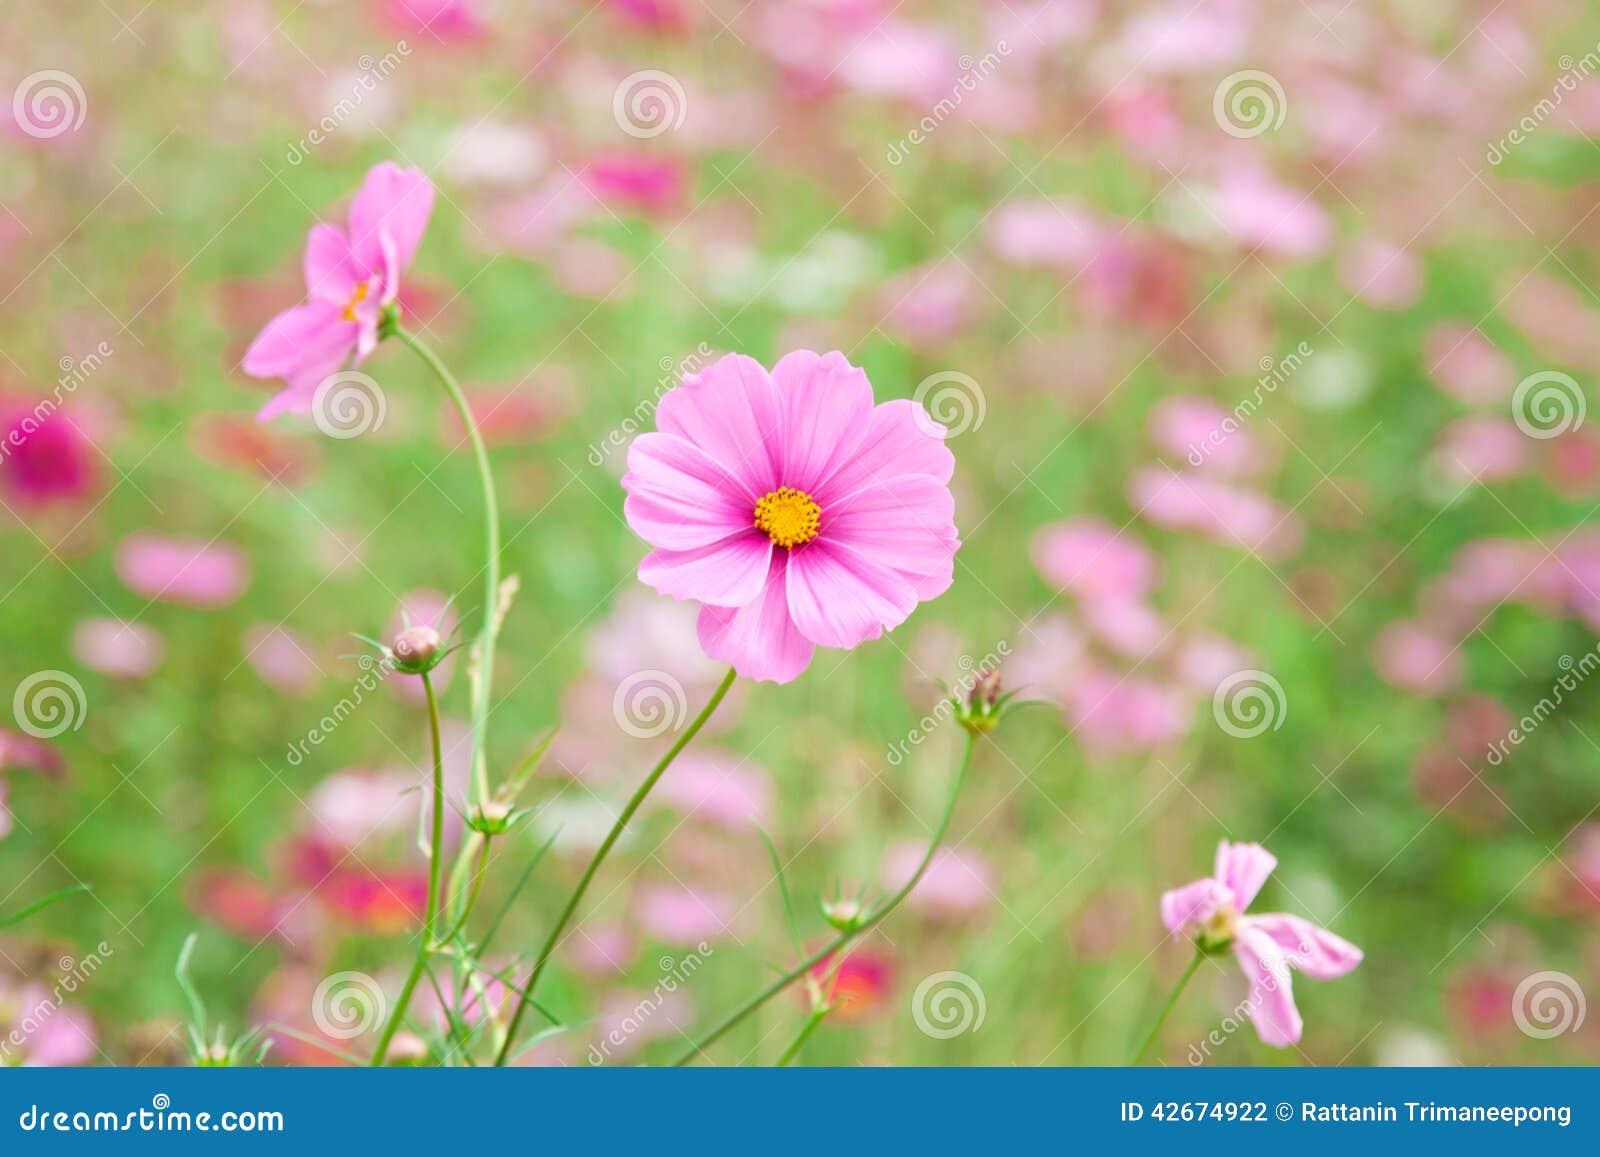 s e rosa blume stockfoto bild von nave floral unsch rfe 42674922. Black Bedroom Furniture Sets. Home Design Ideas